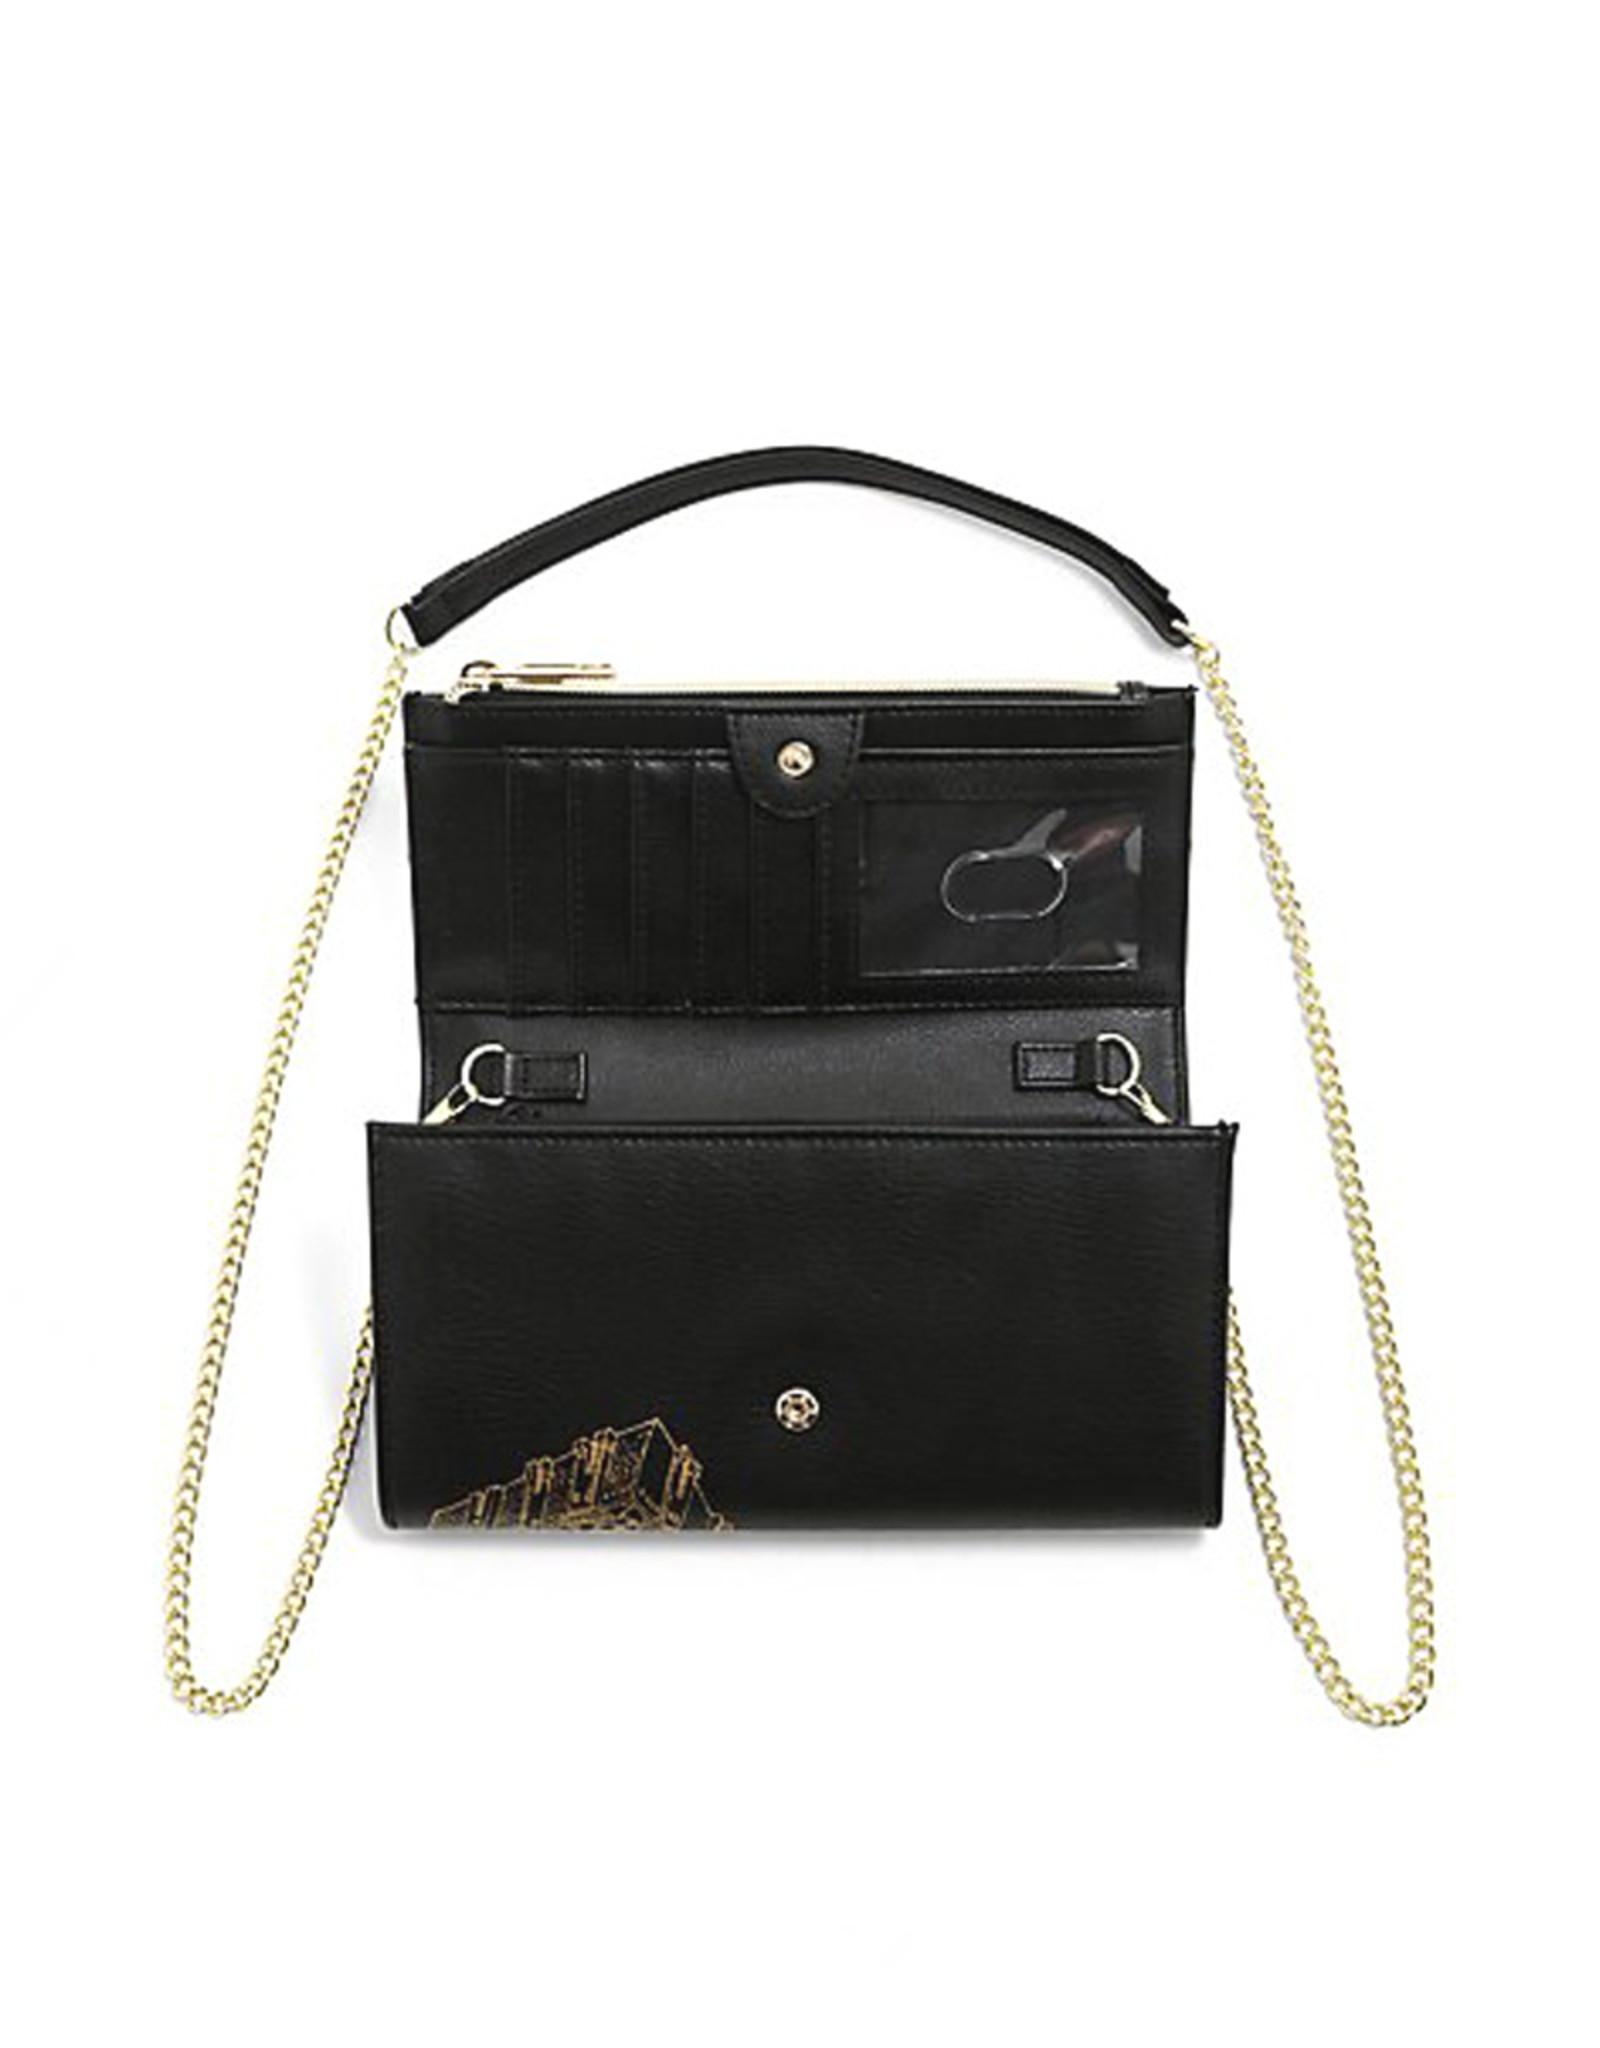 Harry Potter Harry Potter ( Mini Handbag / Wallet ) Mischief Managed